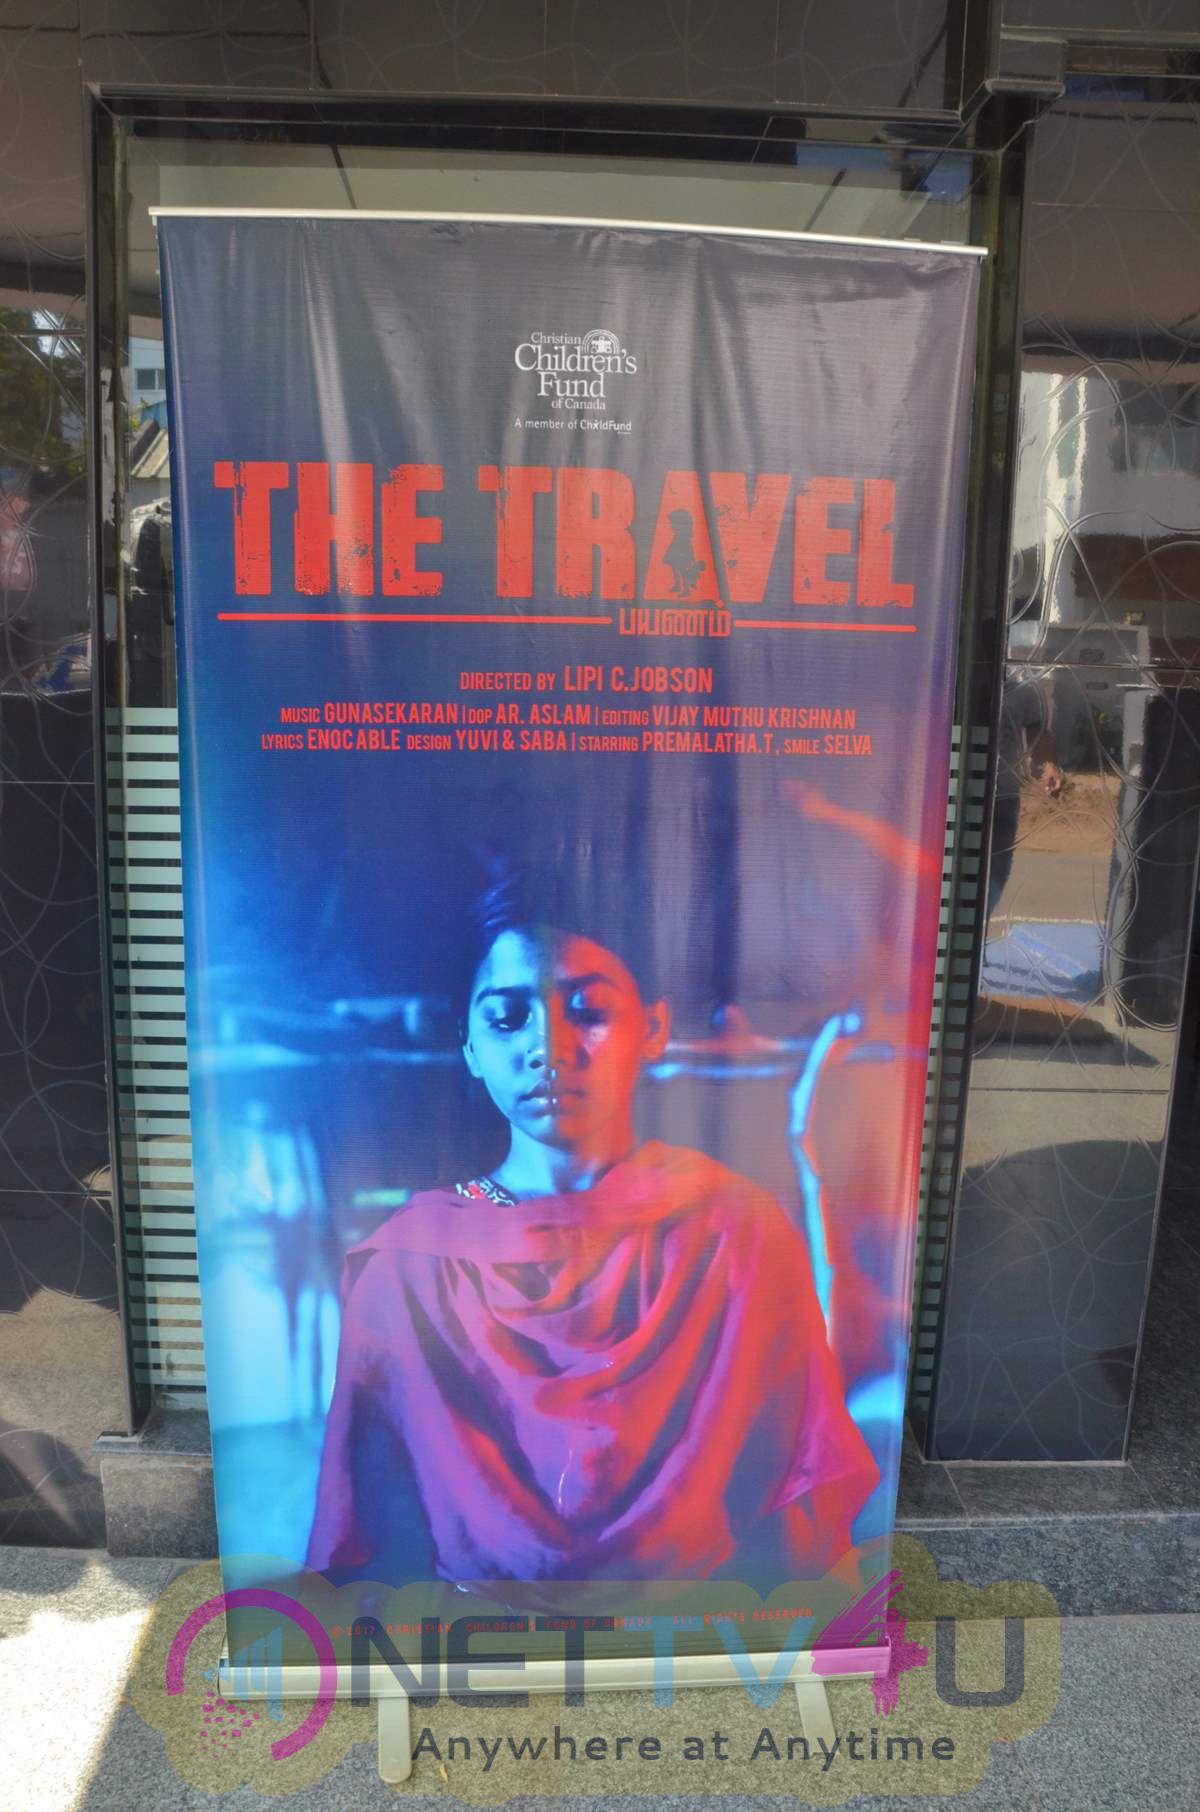 The Travel Short Film Screening Cute Photos